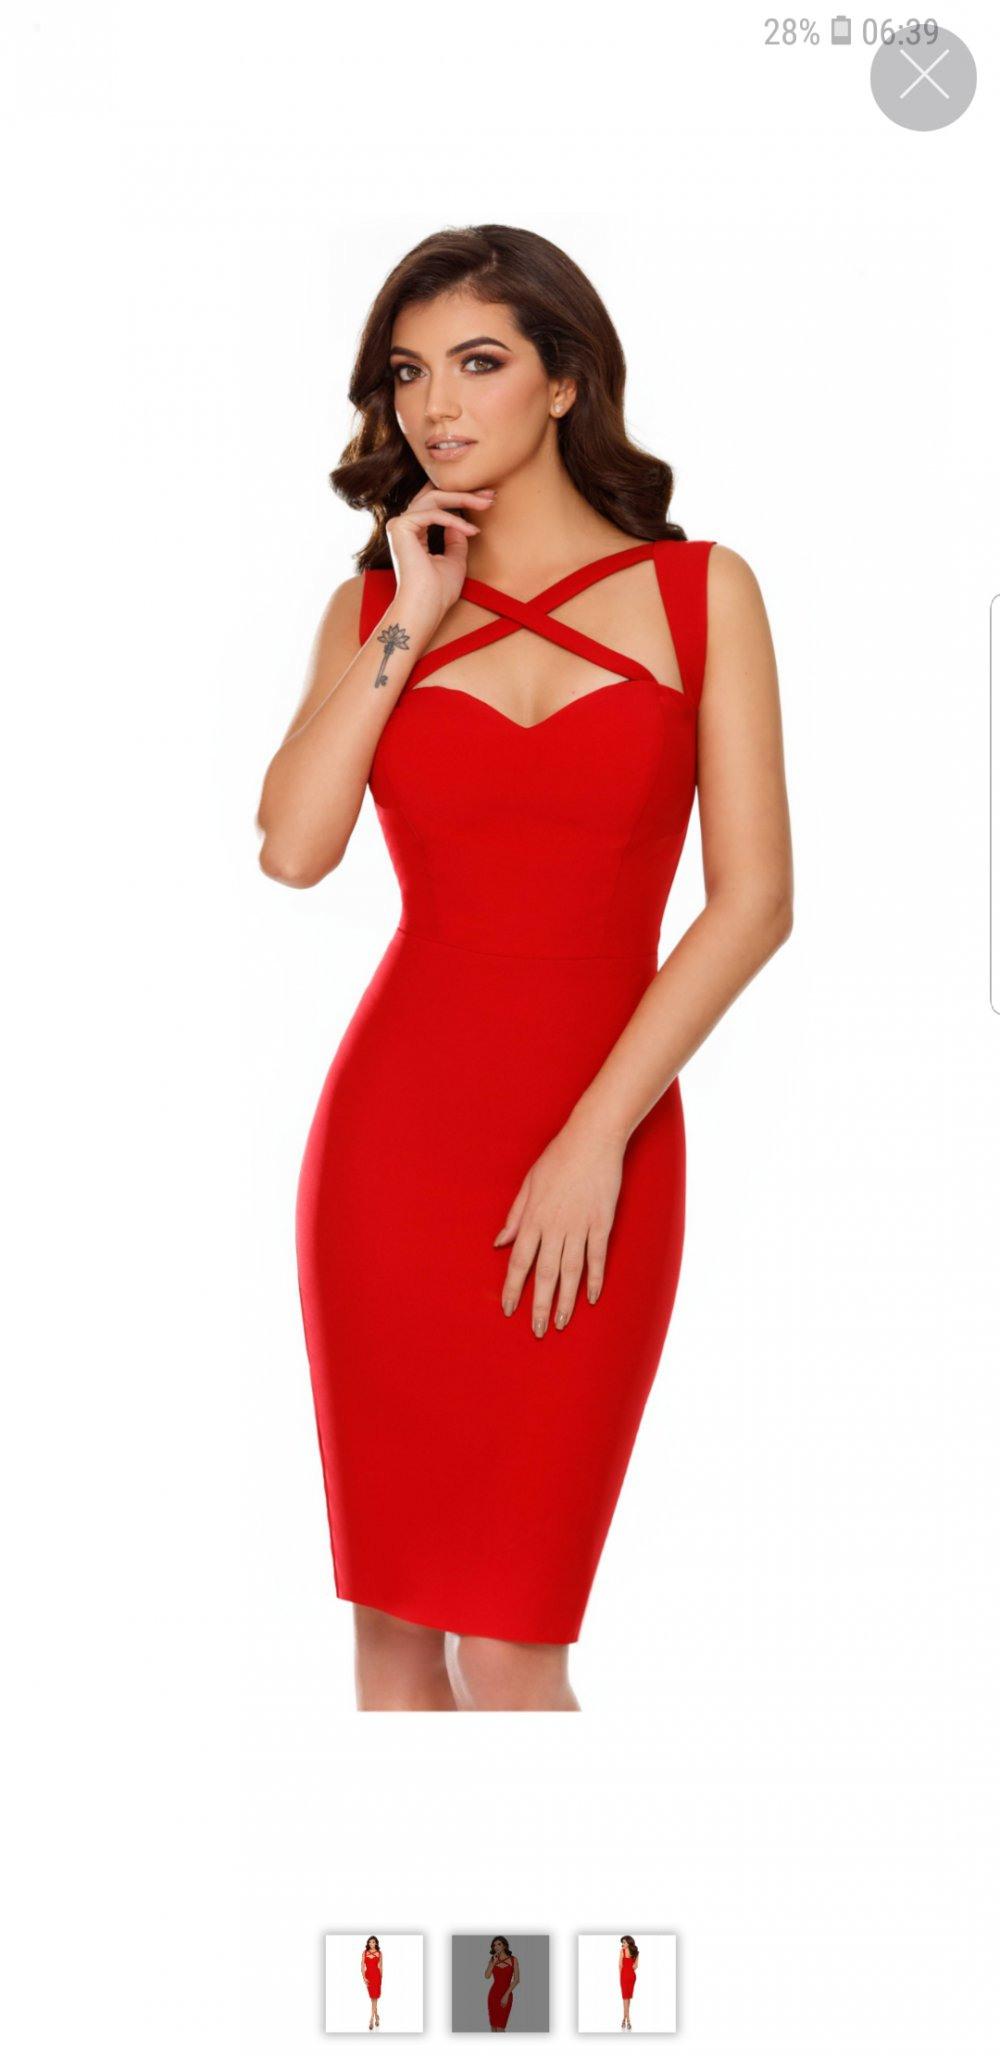 Formal Luxurius Rotes Kleid Kurz Galerie17 Luxurius Rotes Kleid Kurz Stylish